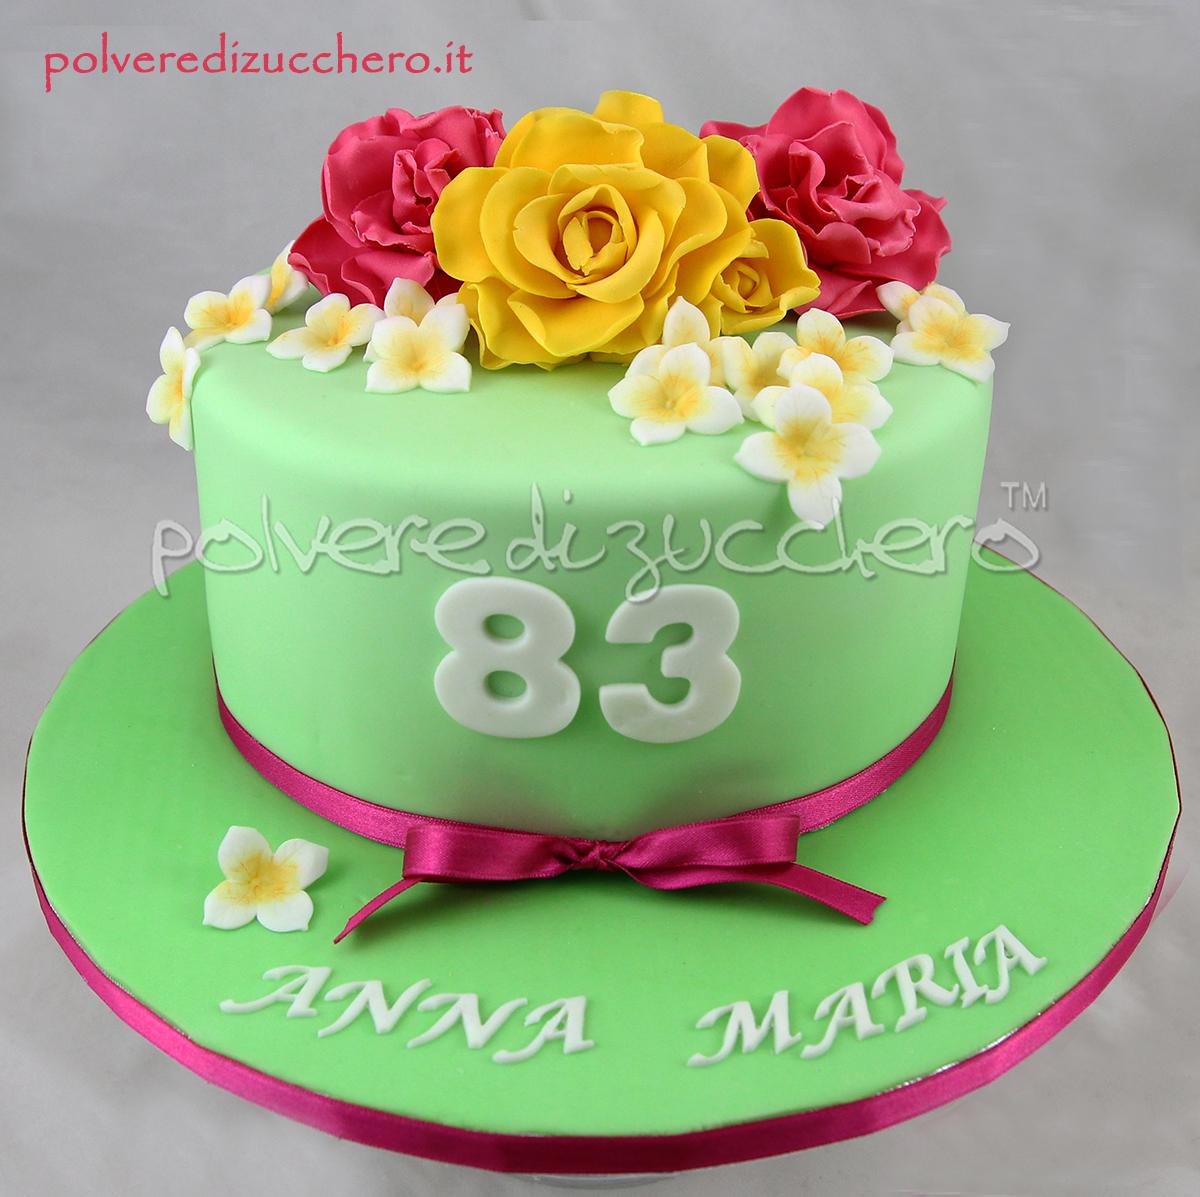 torta decorata cake design pasta di zucchero polvere di zucchero fiori di zucchero rose gialle rose fucsia